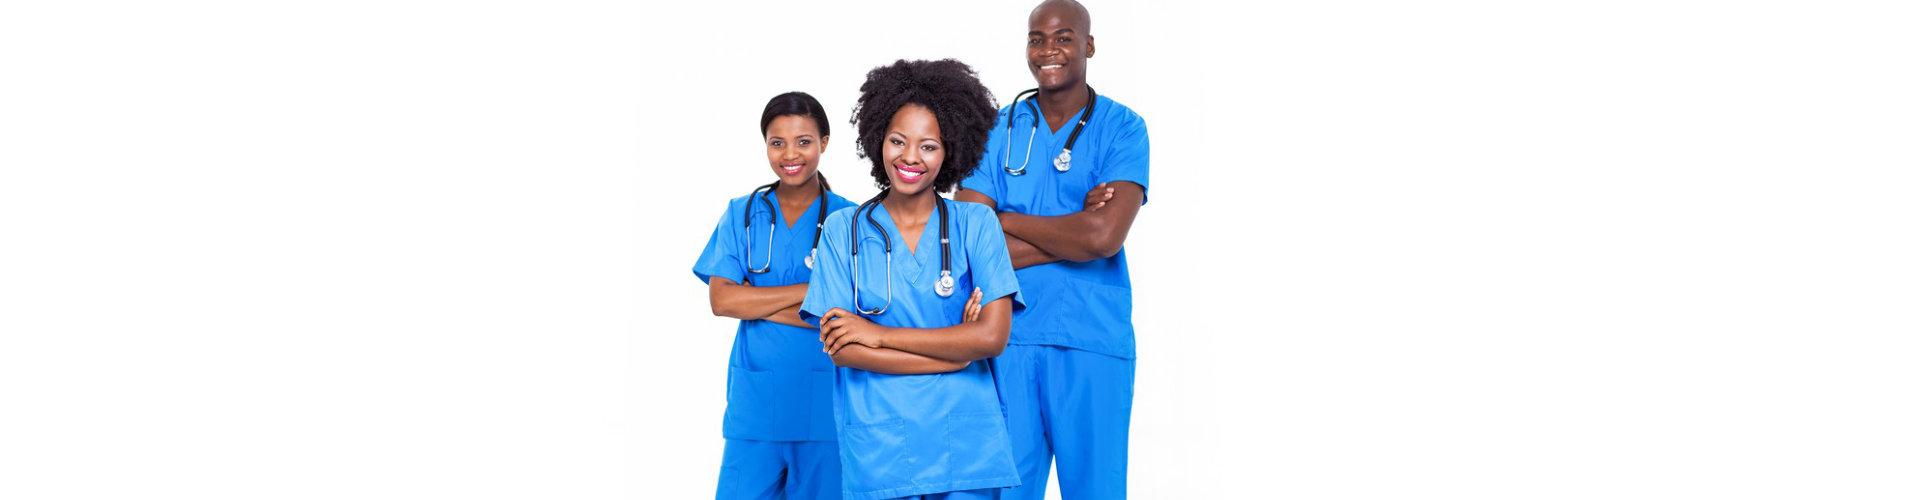 three smiling nurses